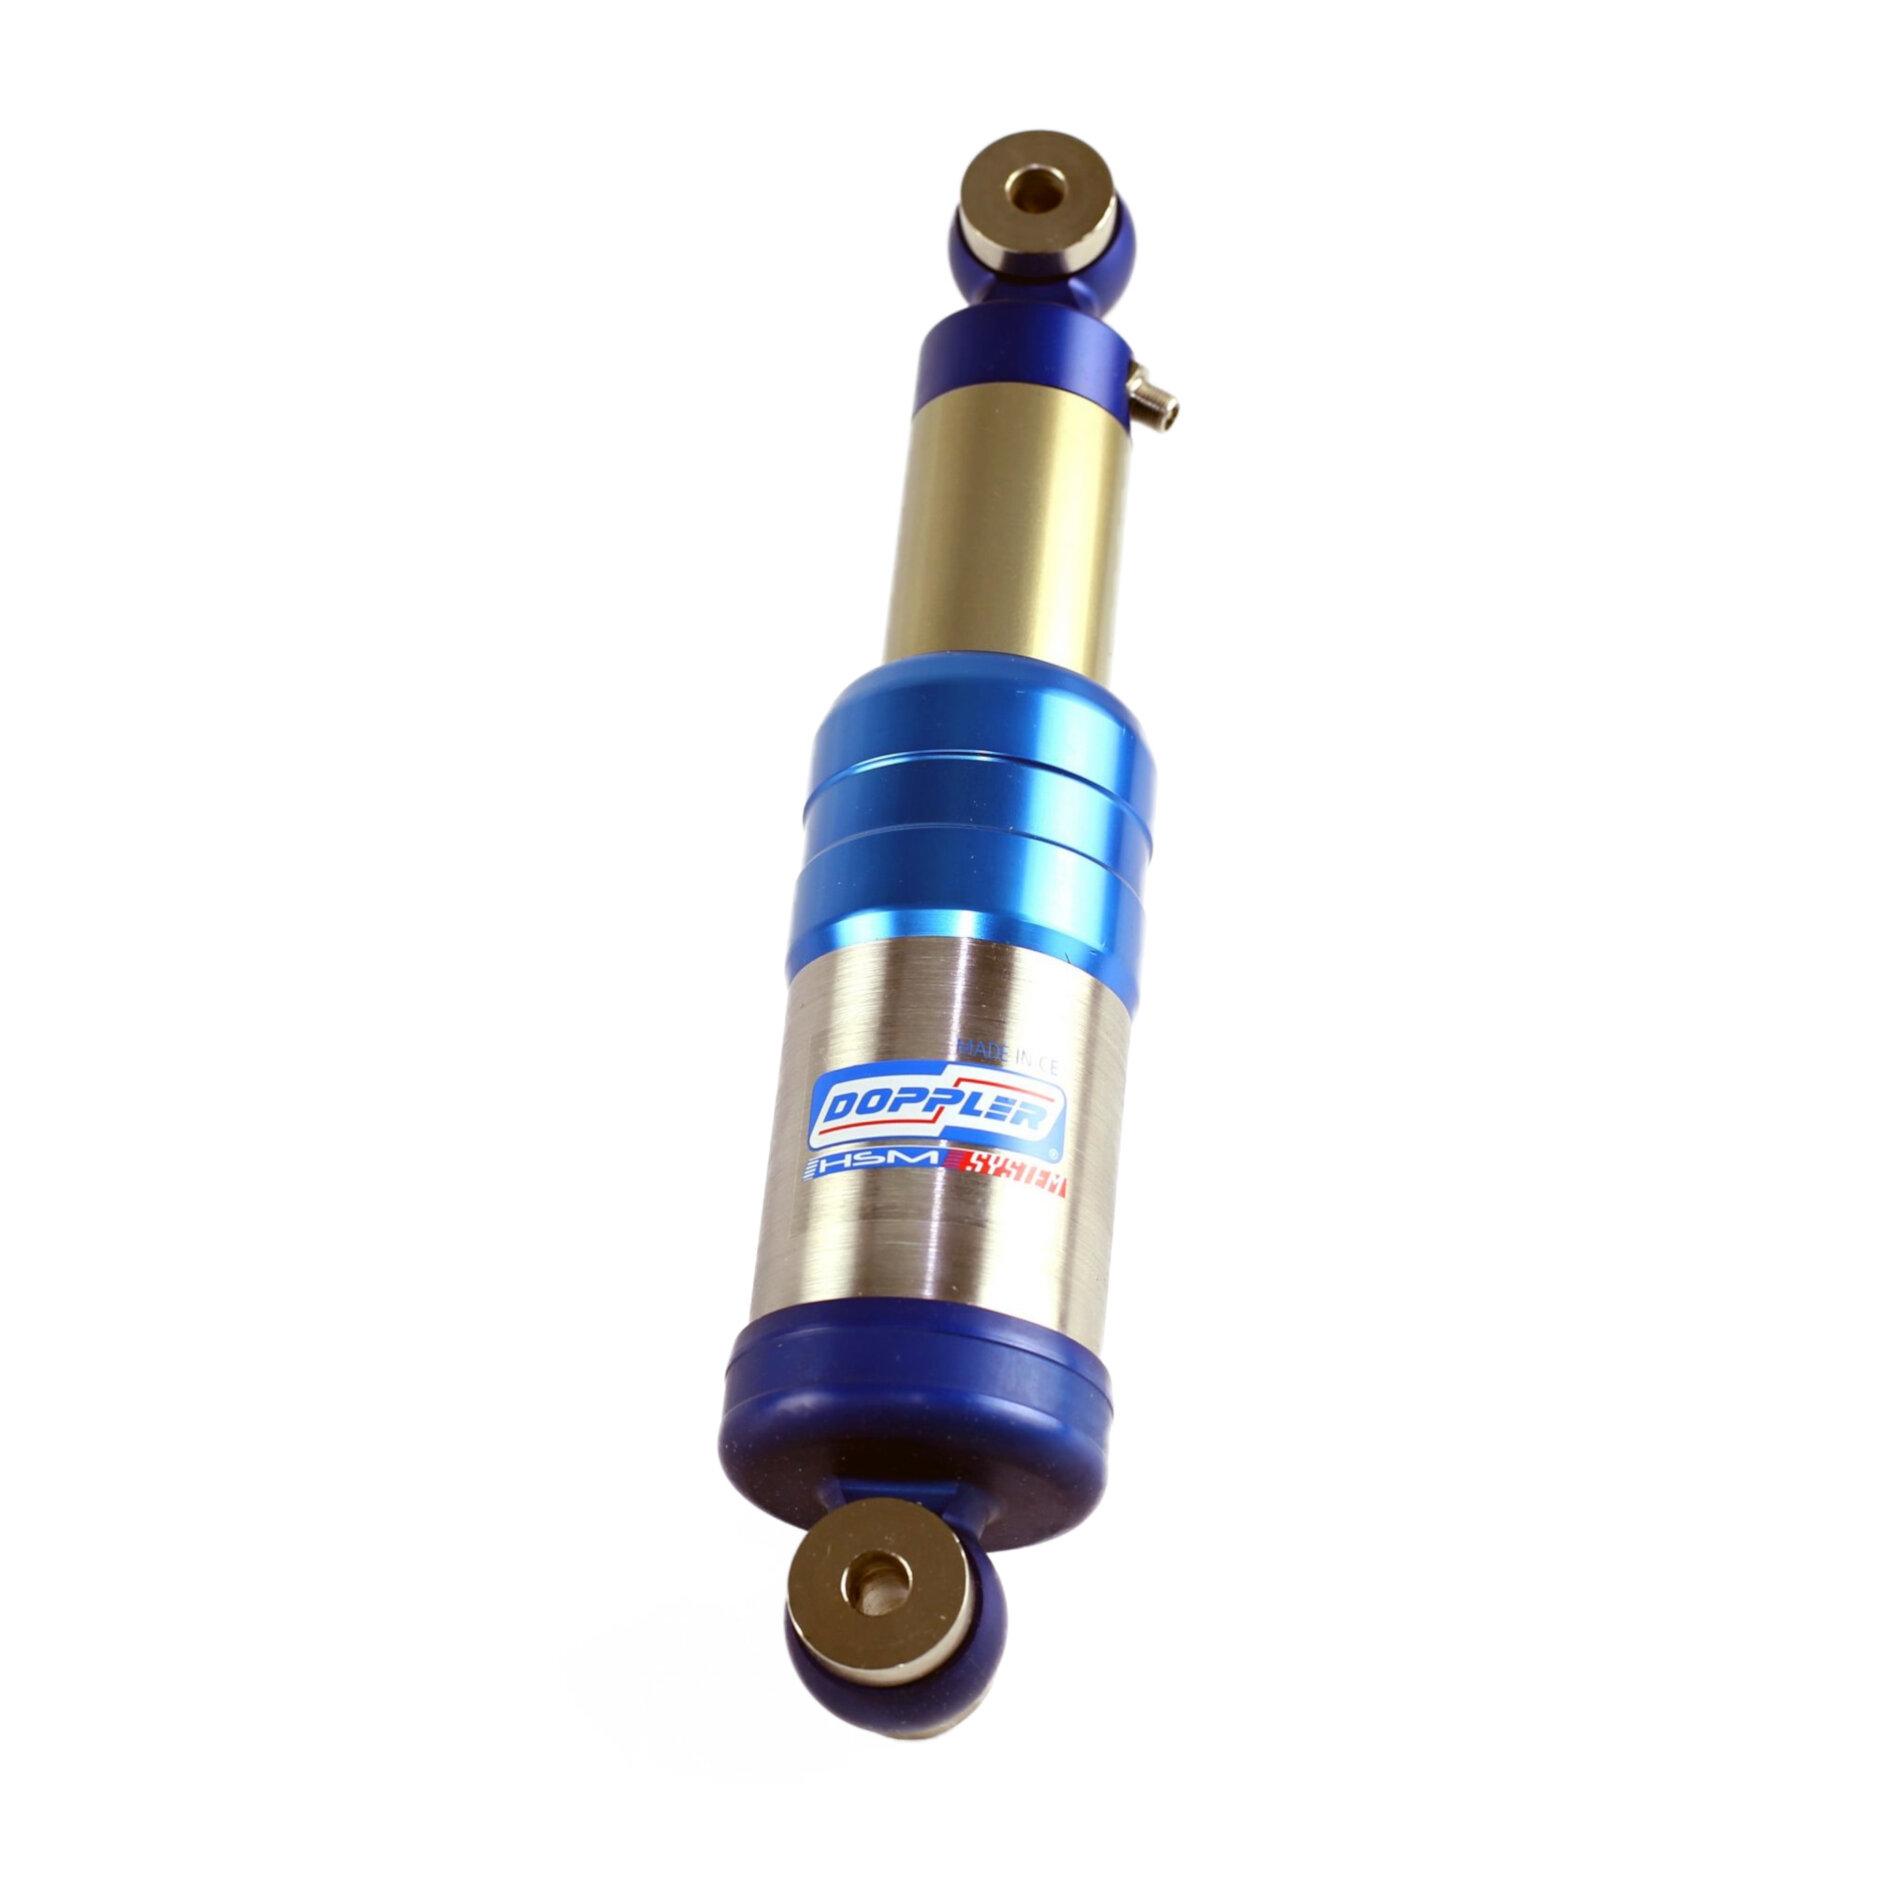 Amortisseur hydraulique Doppler Oleopneumatique (255mm) Aprilia RS 50